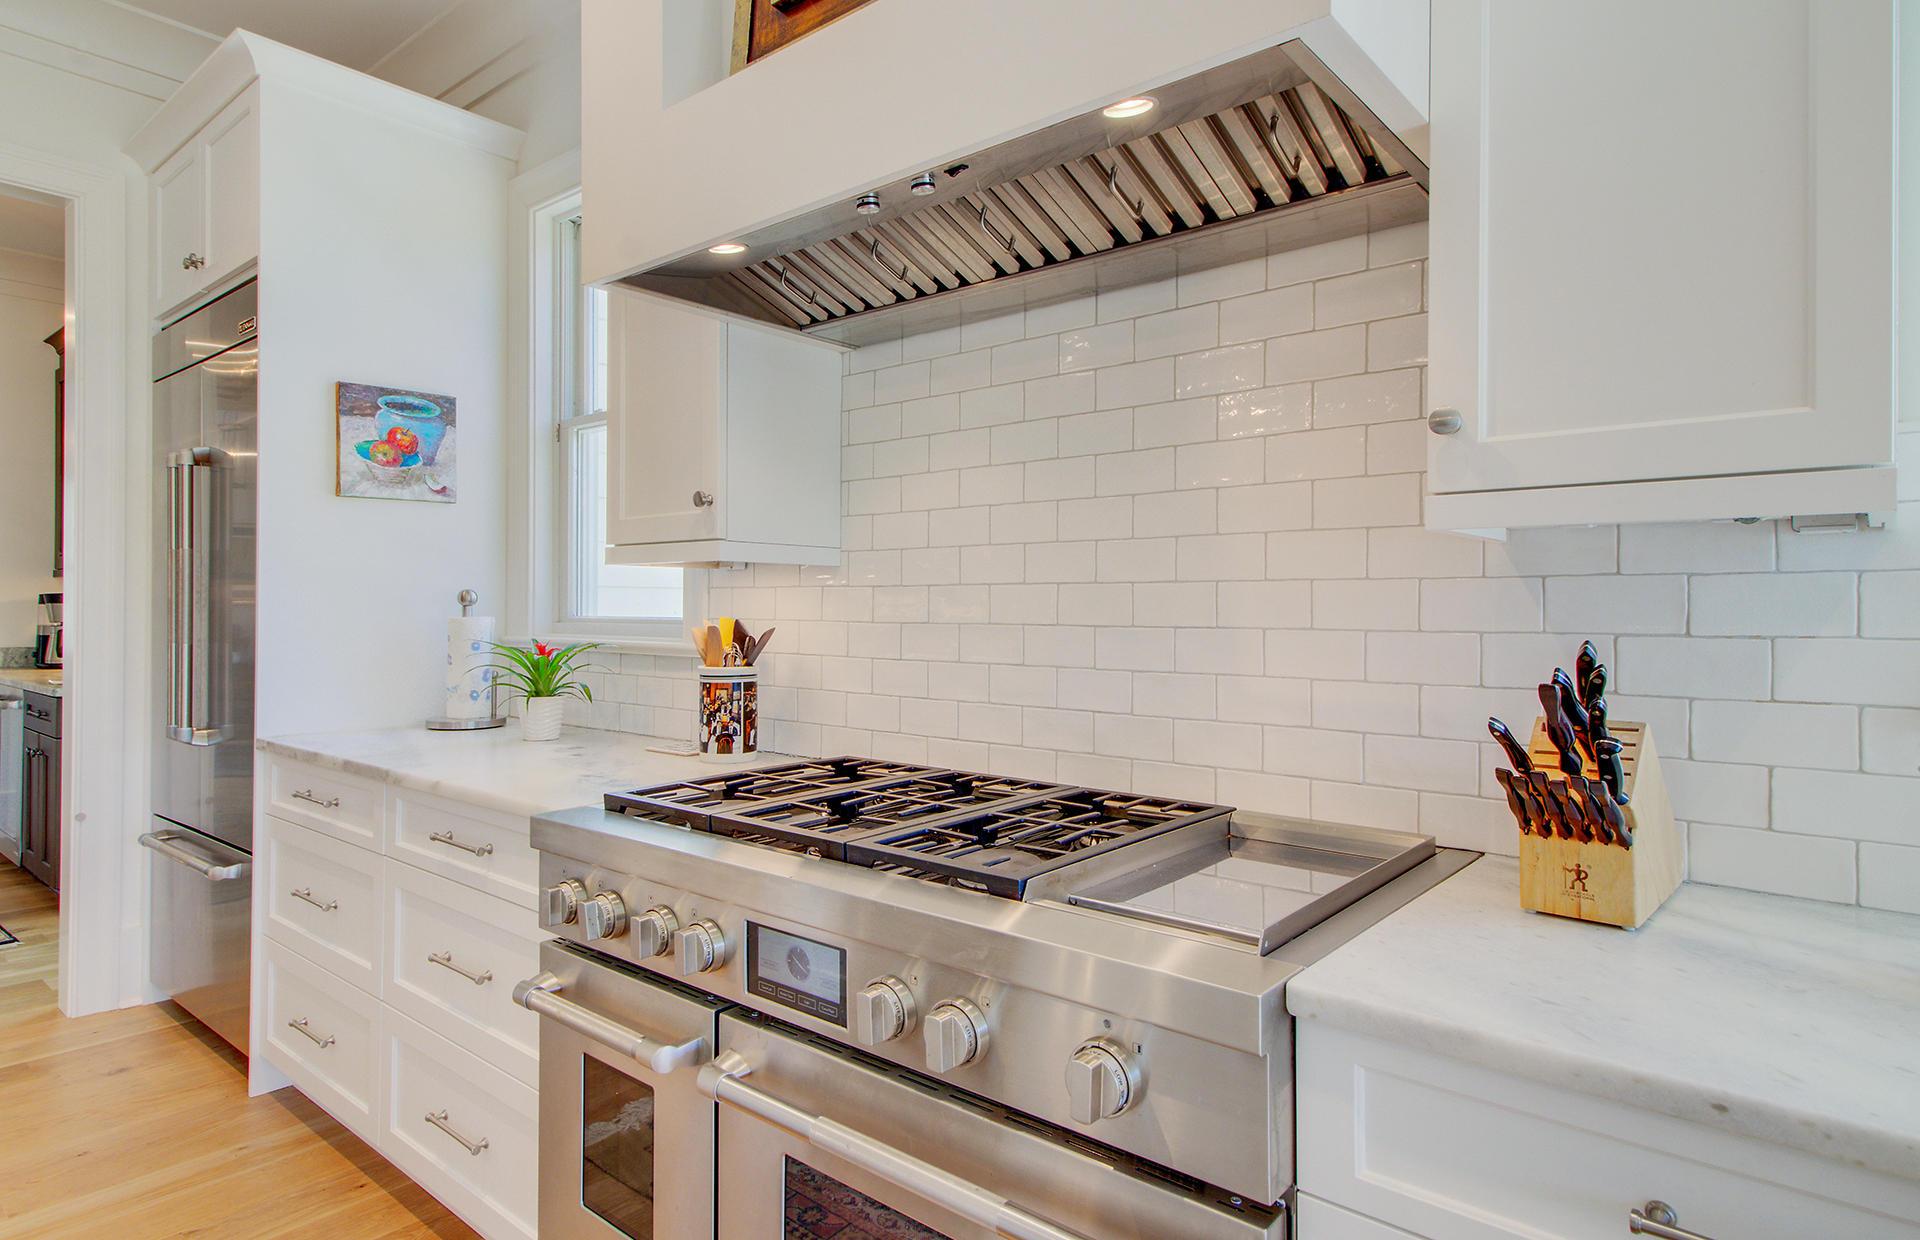 Beresford Hall Homes For Sale - 253 Grand Park, Charleston, SC - 6